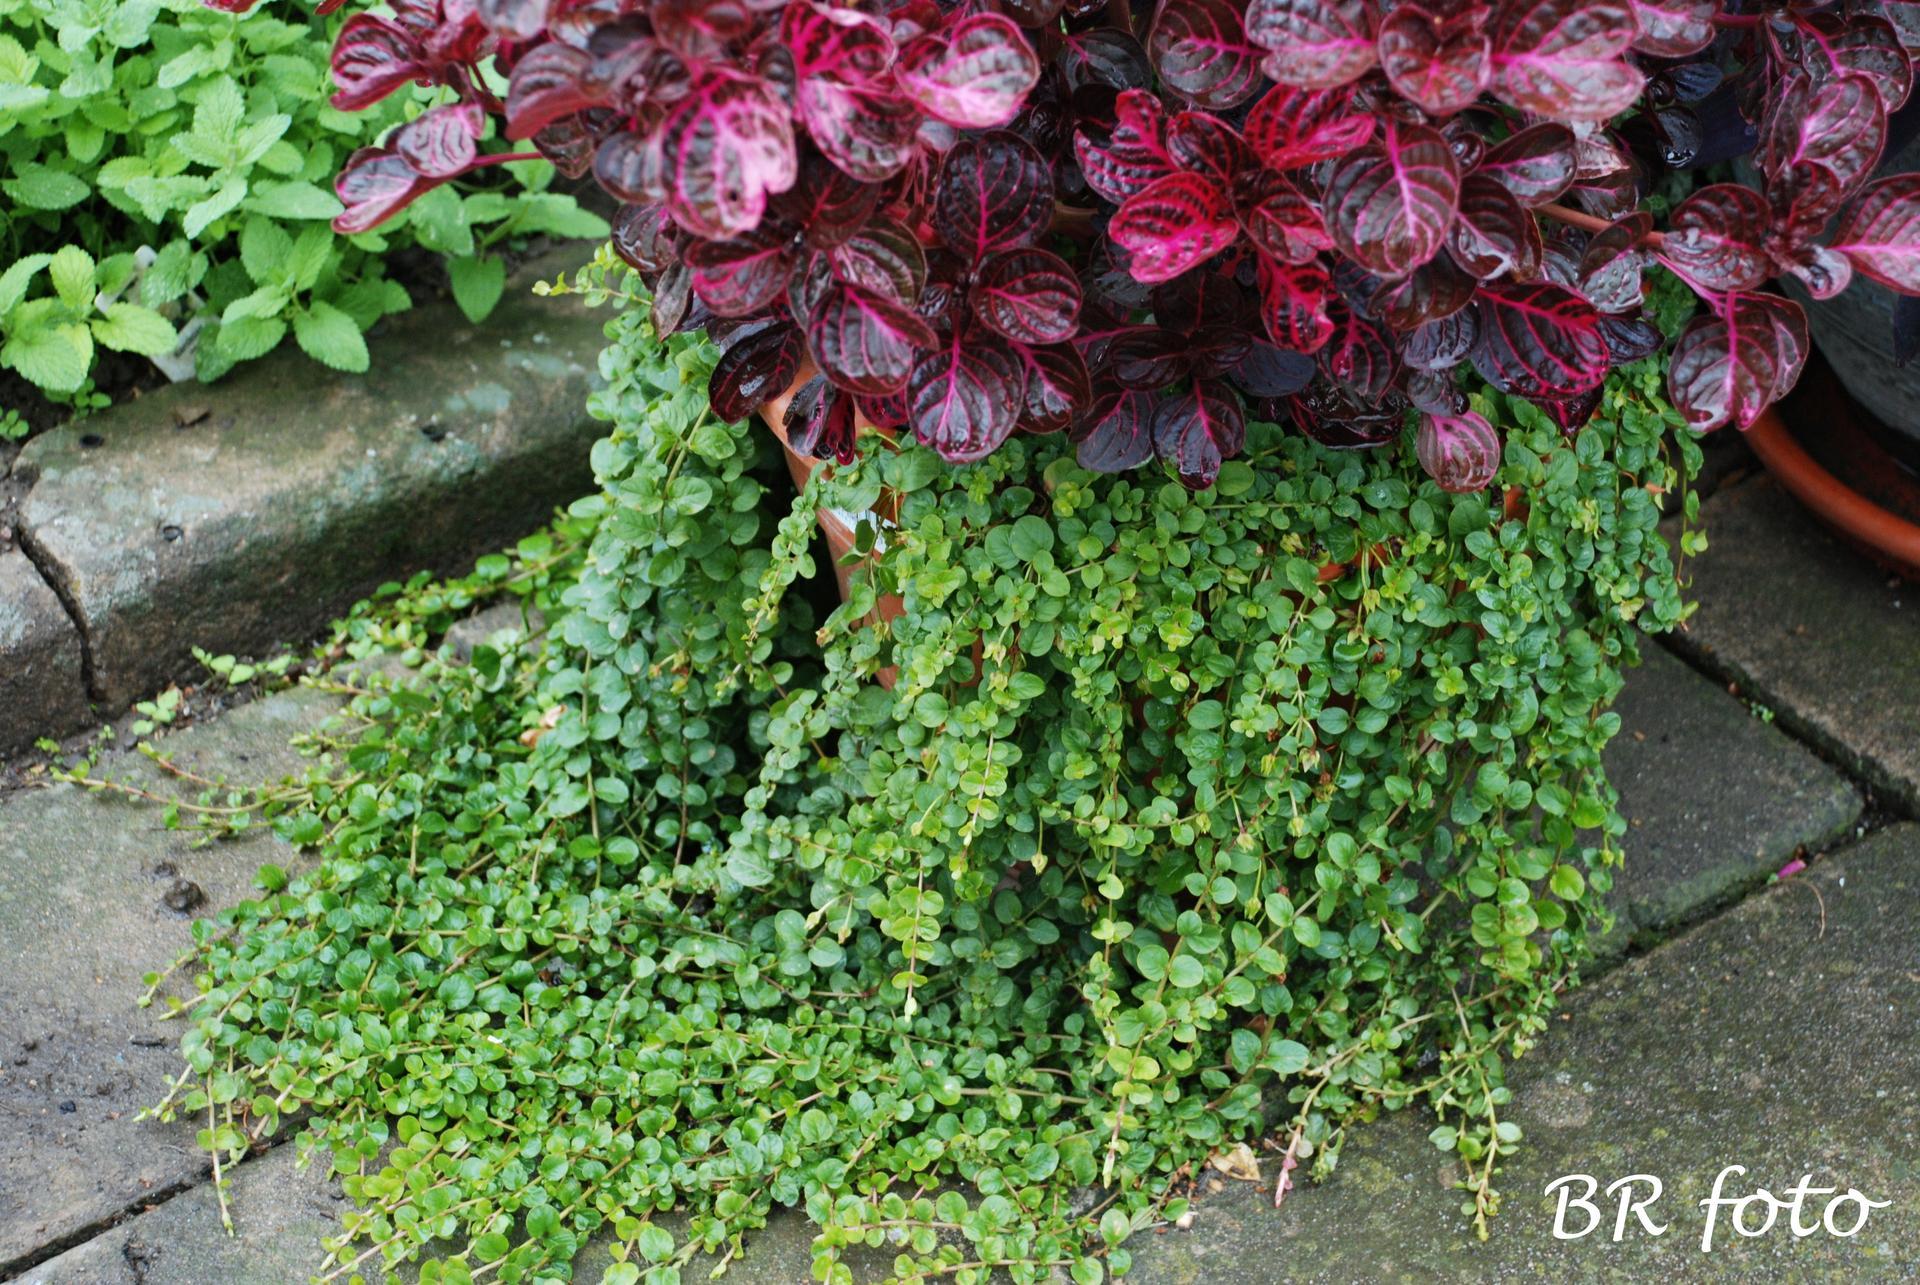 Zahrada v létě - irezína a vrbina penízková